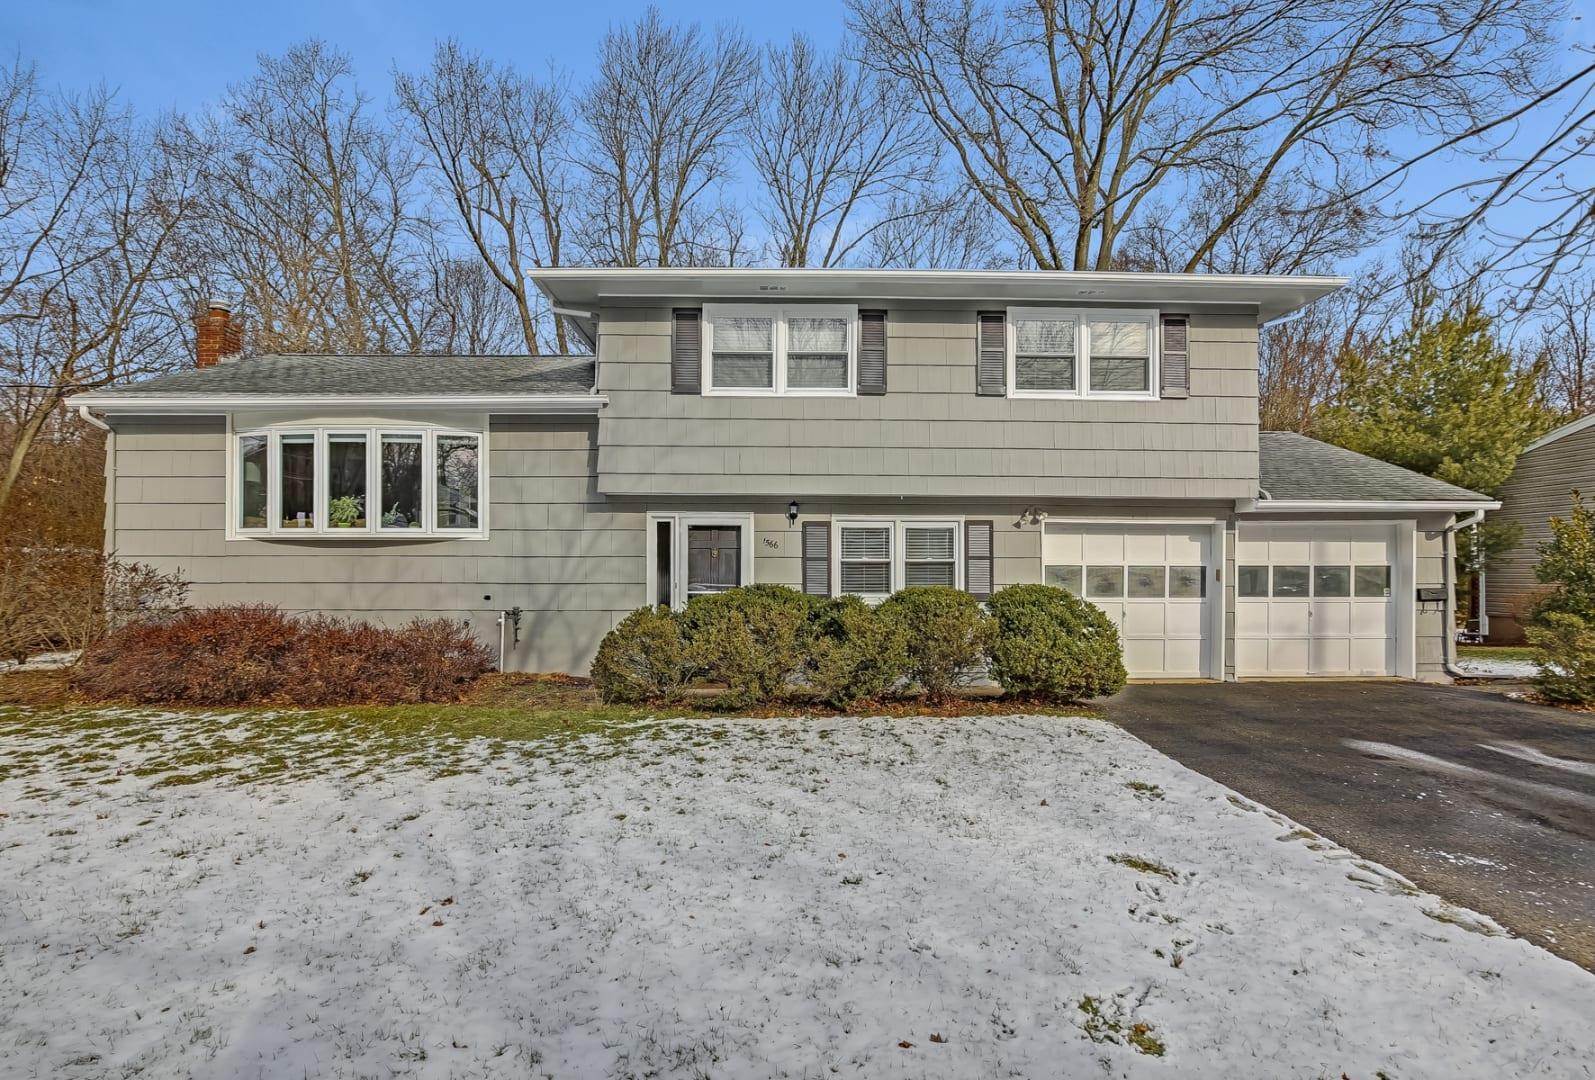 1566 Brookside Rd, Mountainside, NJ 07092